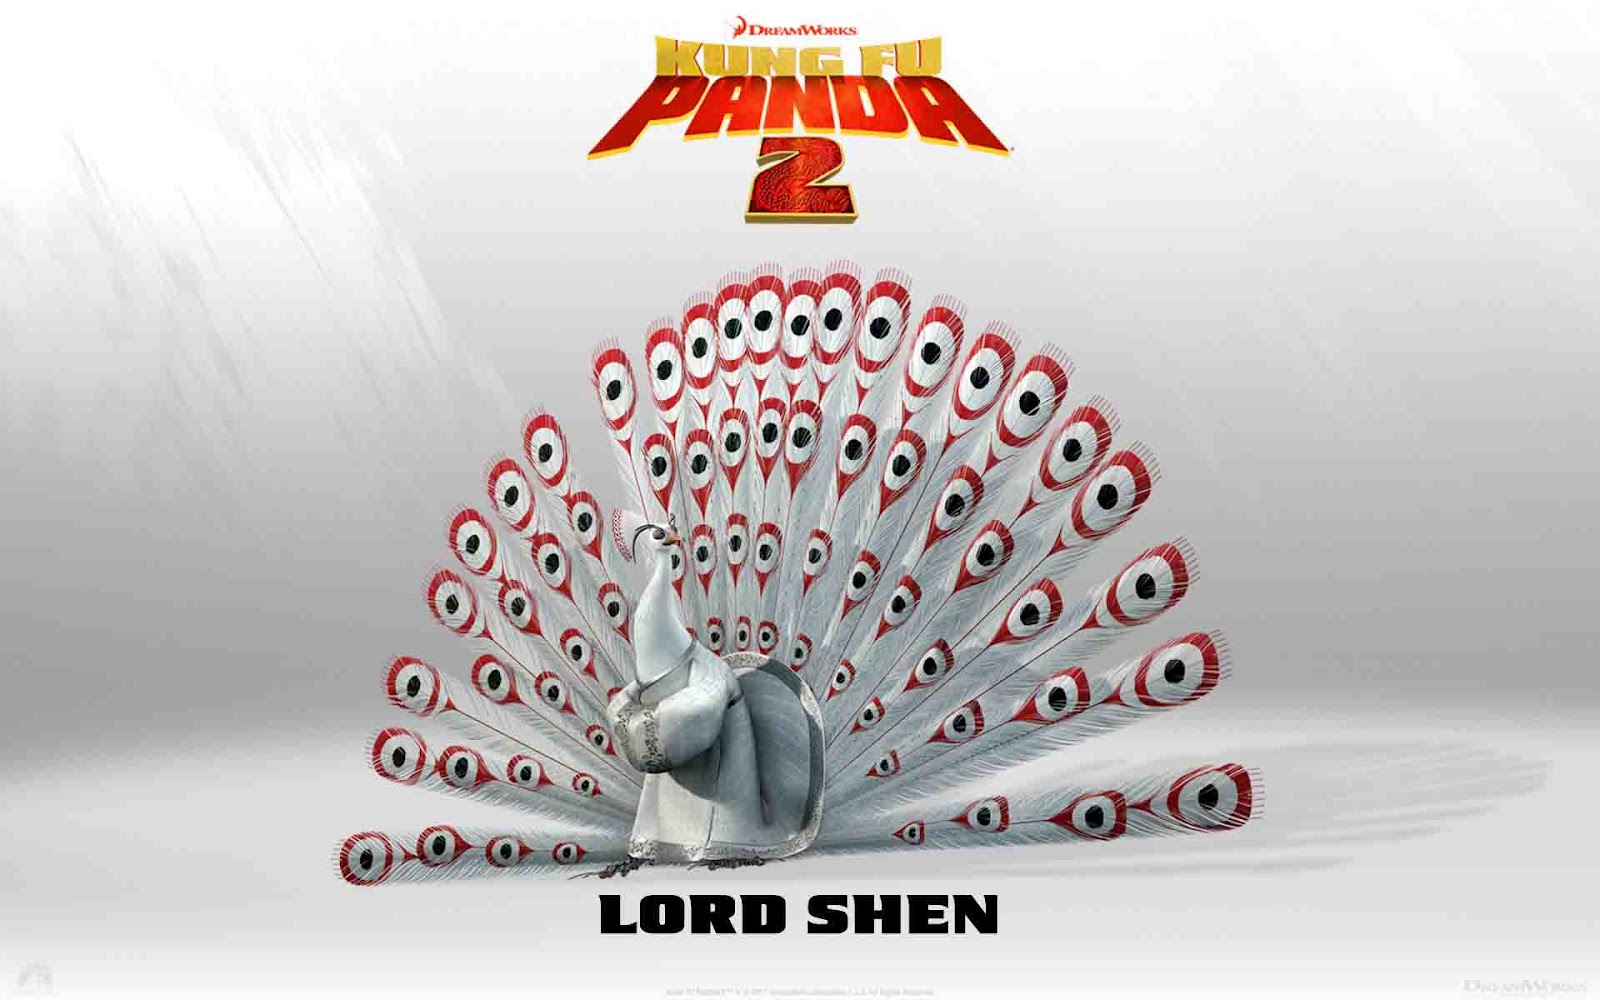 http://4.bp.blogspot.com/-mZ_1LR7PO2k/T02pMg876jI/AAAAAAAAAhk/6R1qkw_A_m0/s1600/kung-fu-panda-2-lordshen.jpg